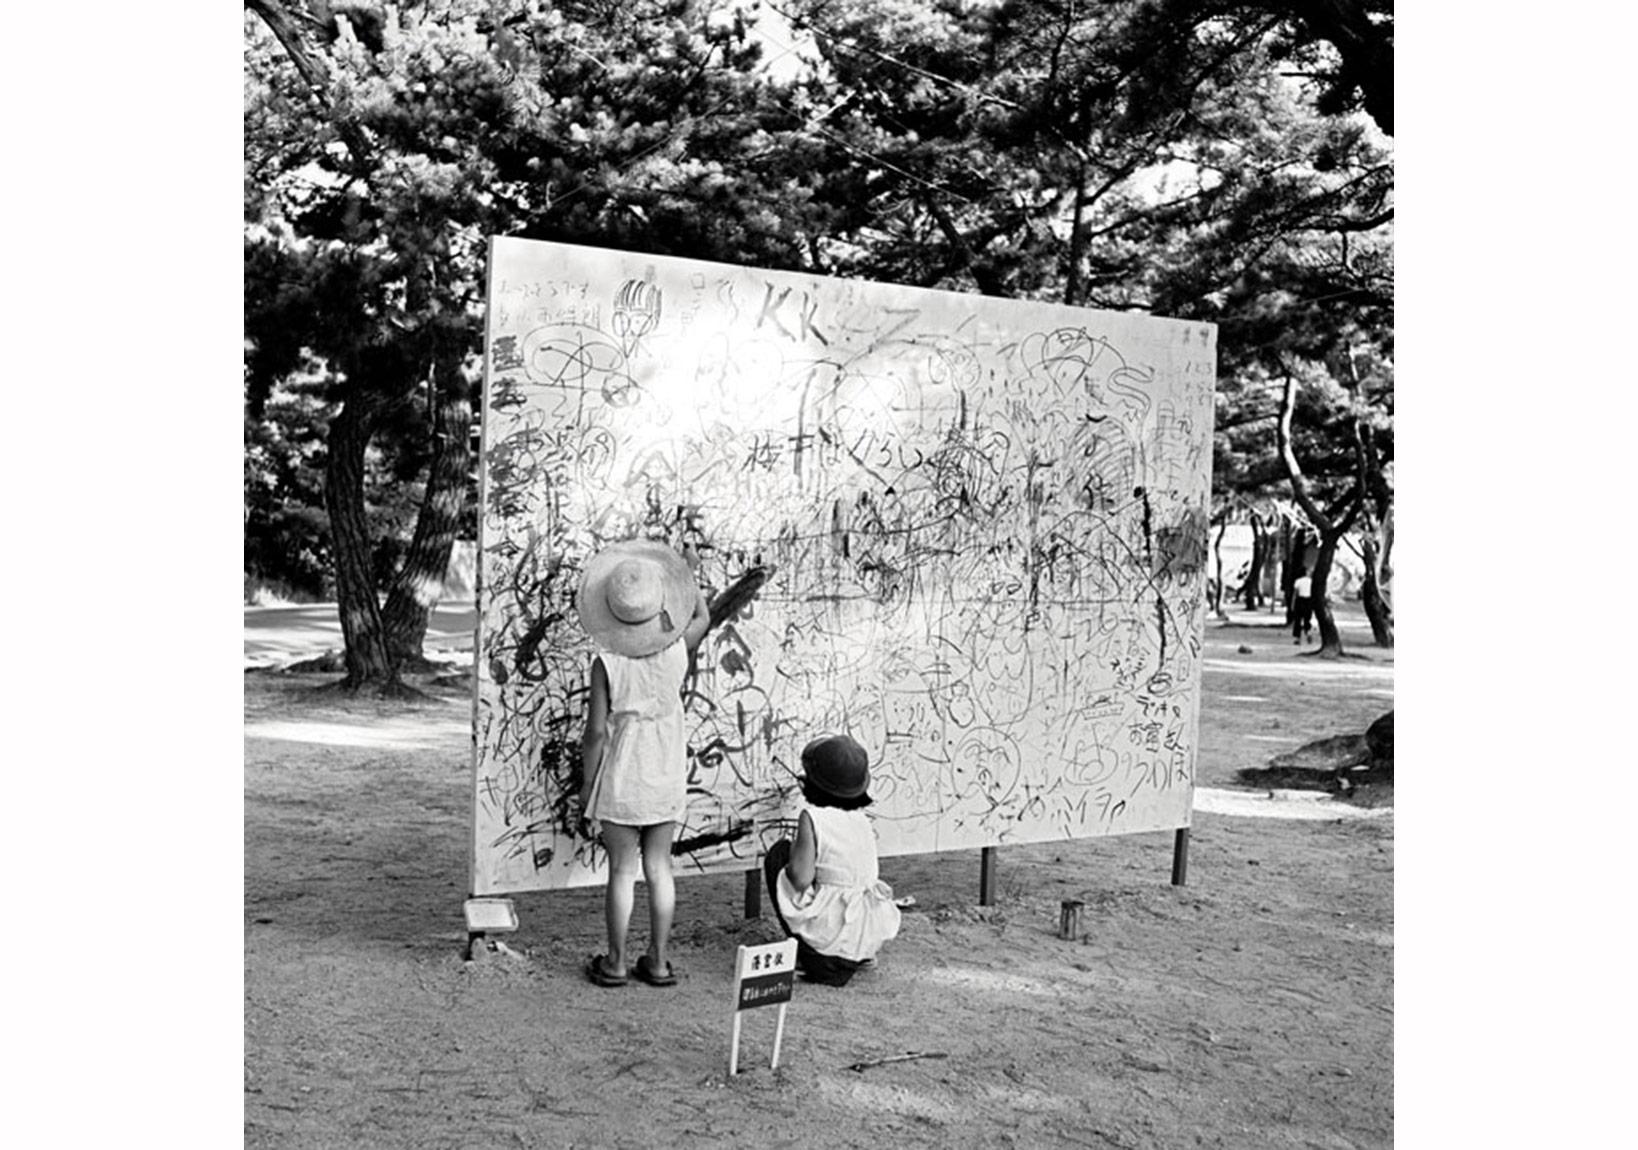 Yoshihara Jirō, Lütfen Özgürce Çiziniz, 1956, 200 × 450 × 3 cm. Gutai Açıkhava Sanat Sergisi Ashiya Park, Ashiya, 27 Haziran – 5 Ağustos 1956